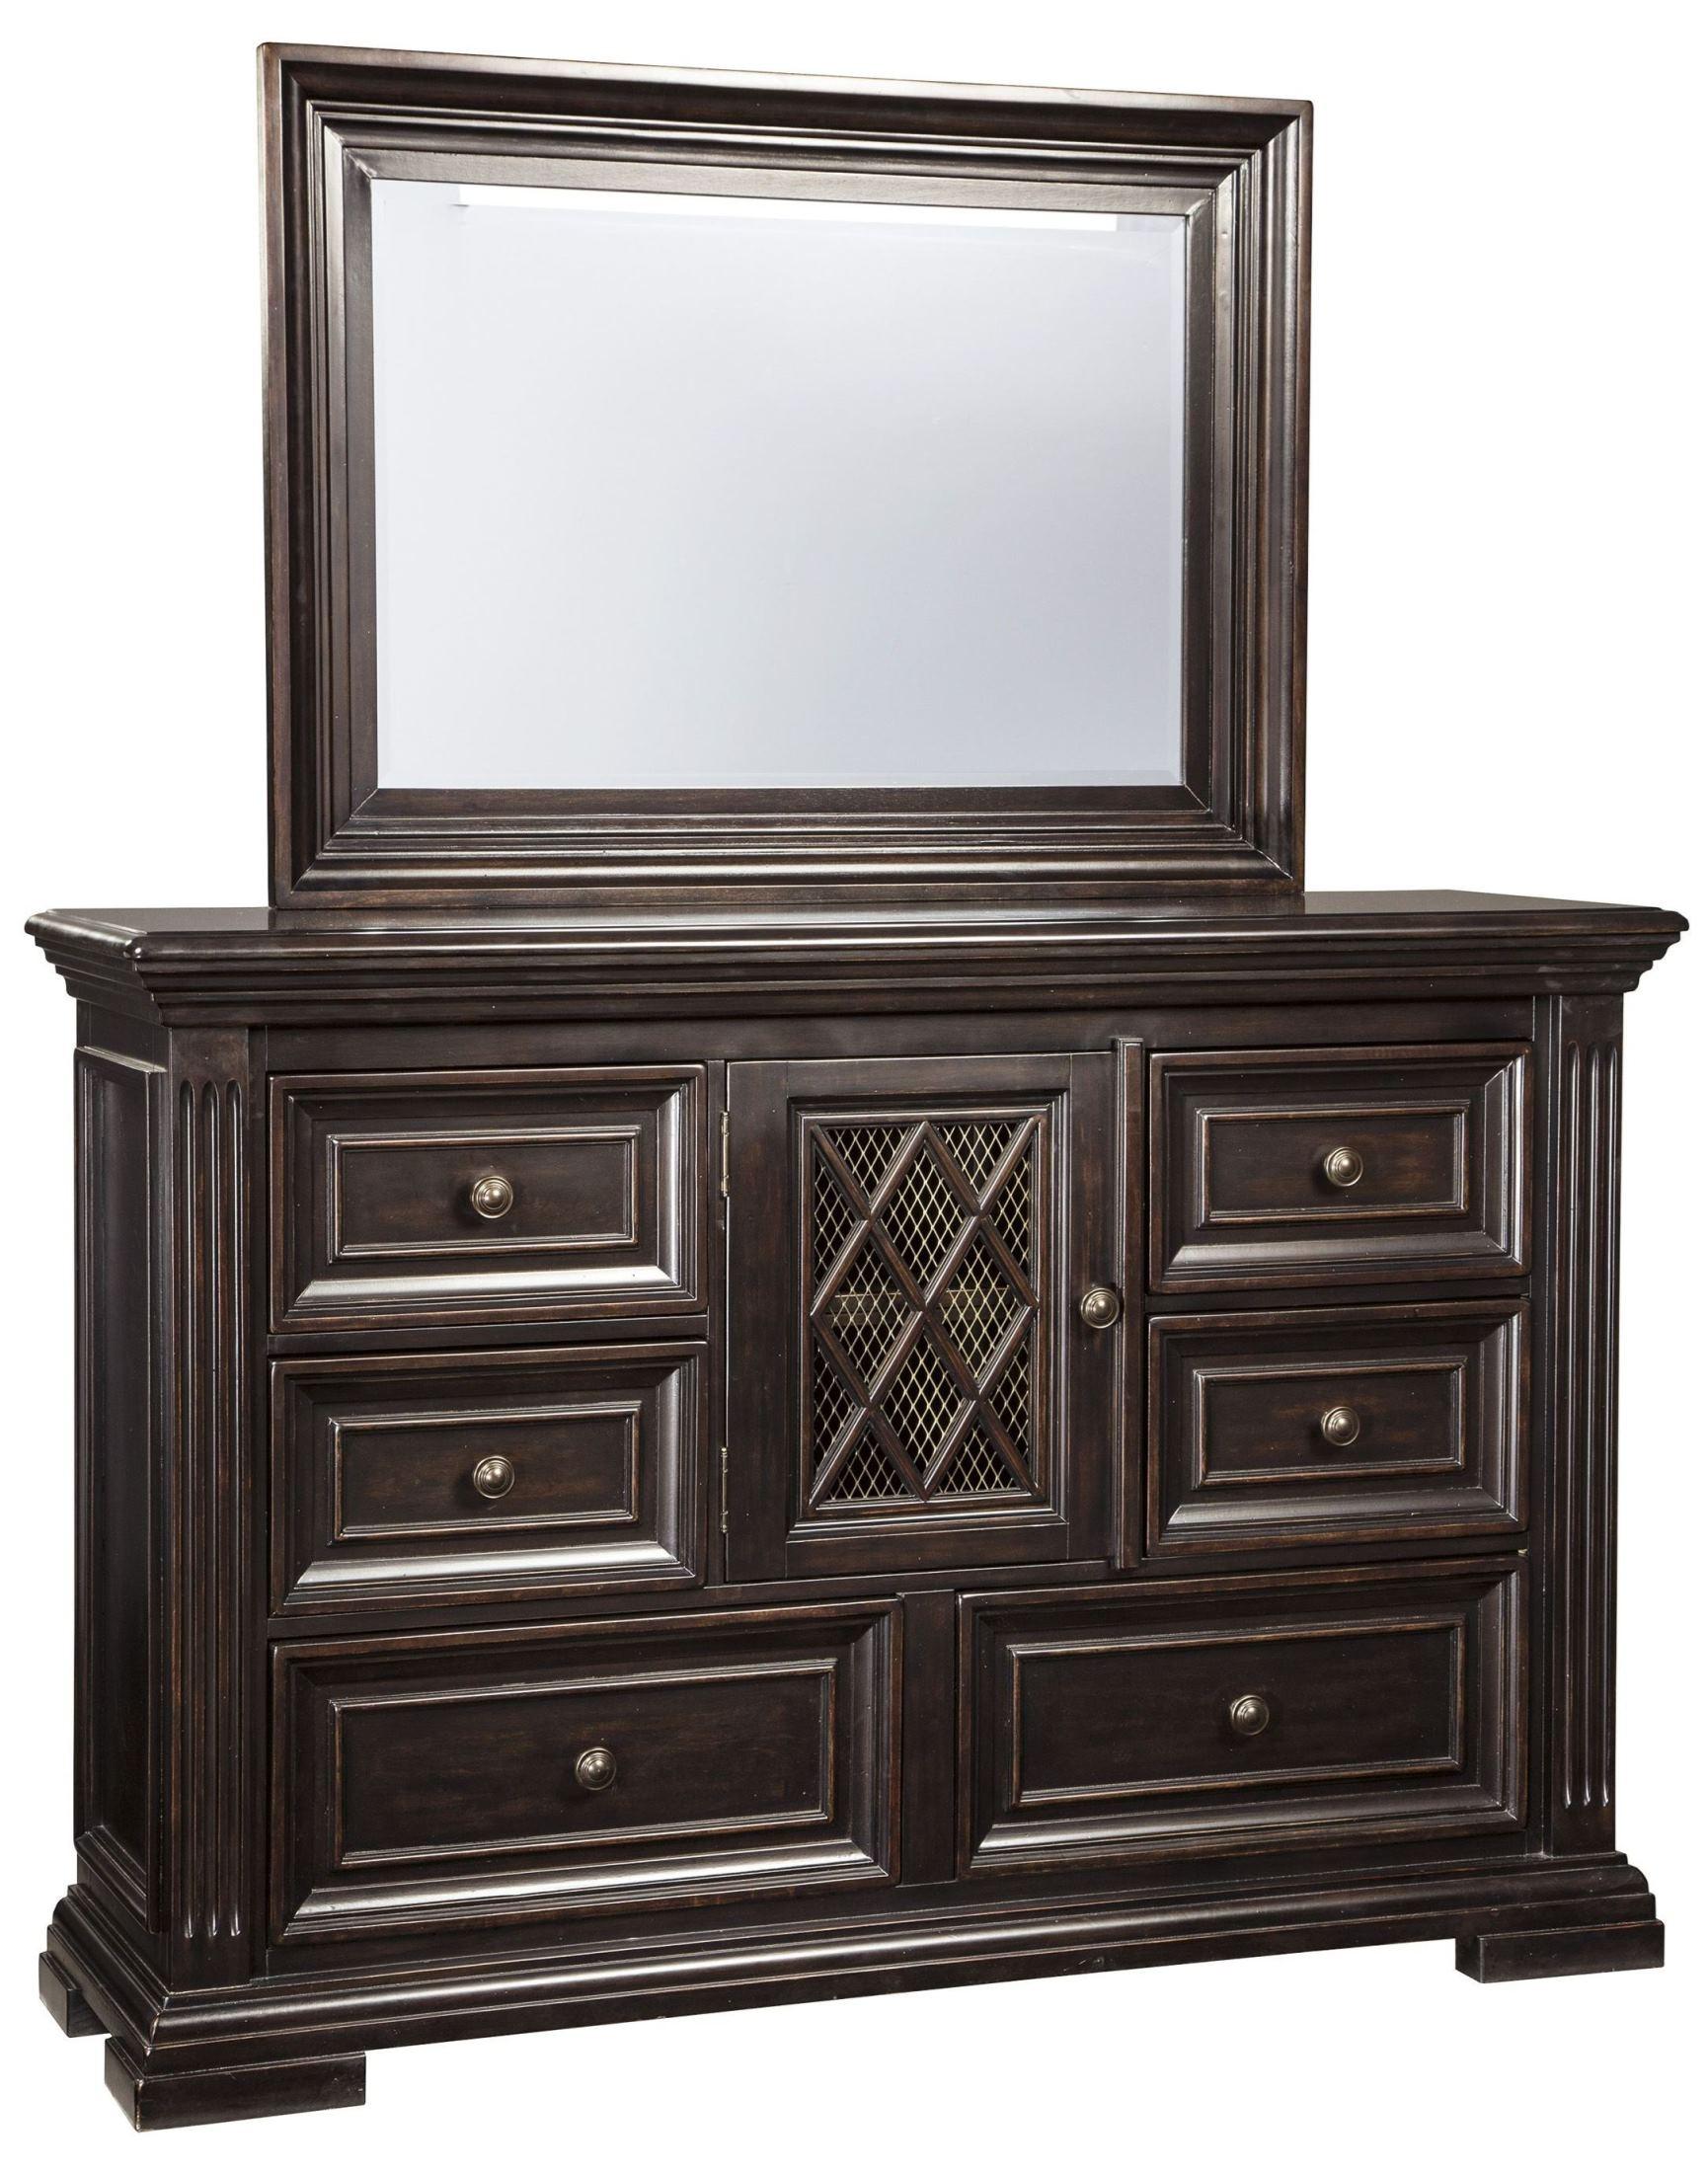 Willenburg dark brown panel bedroom set b643 57 54 96 ashley for Dark brown bedroom furniture